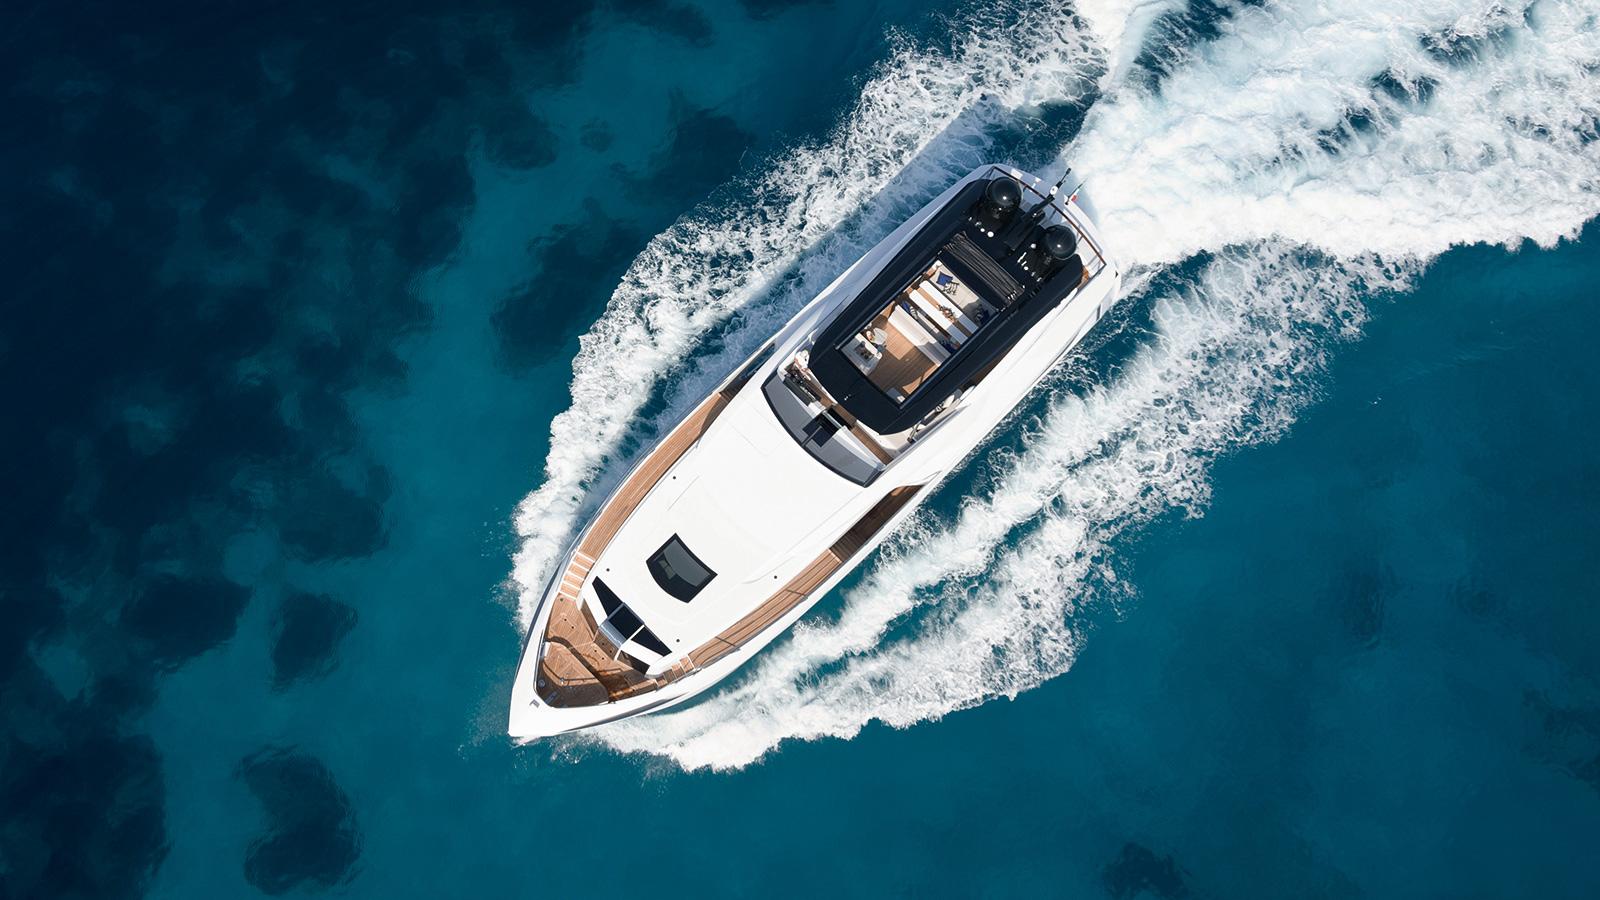 aerial-view-of-the-dominator-ilumen-yacht-kalliente-credit-jeff-brown-breed-media